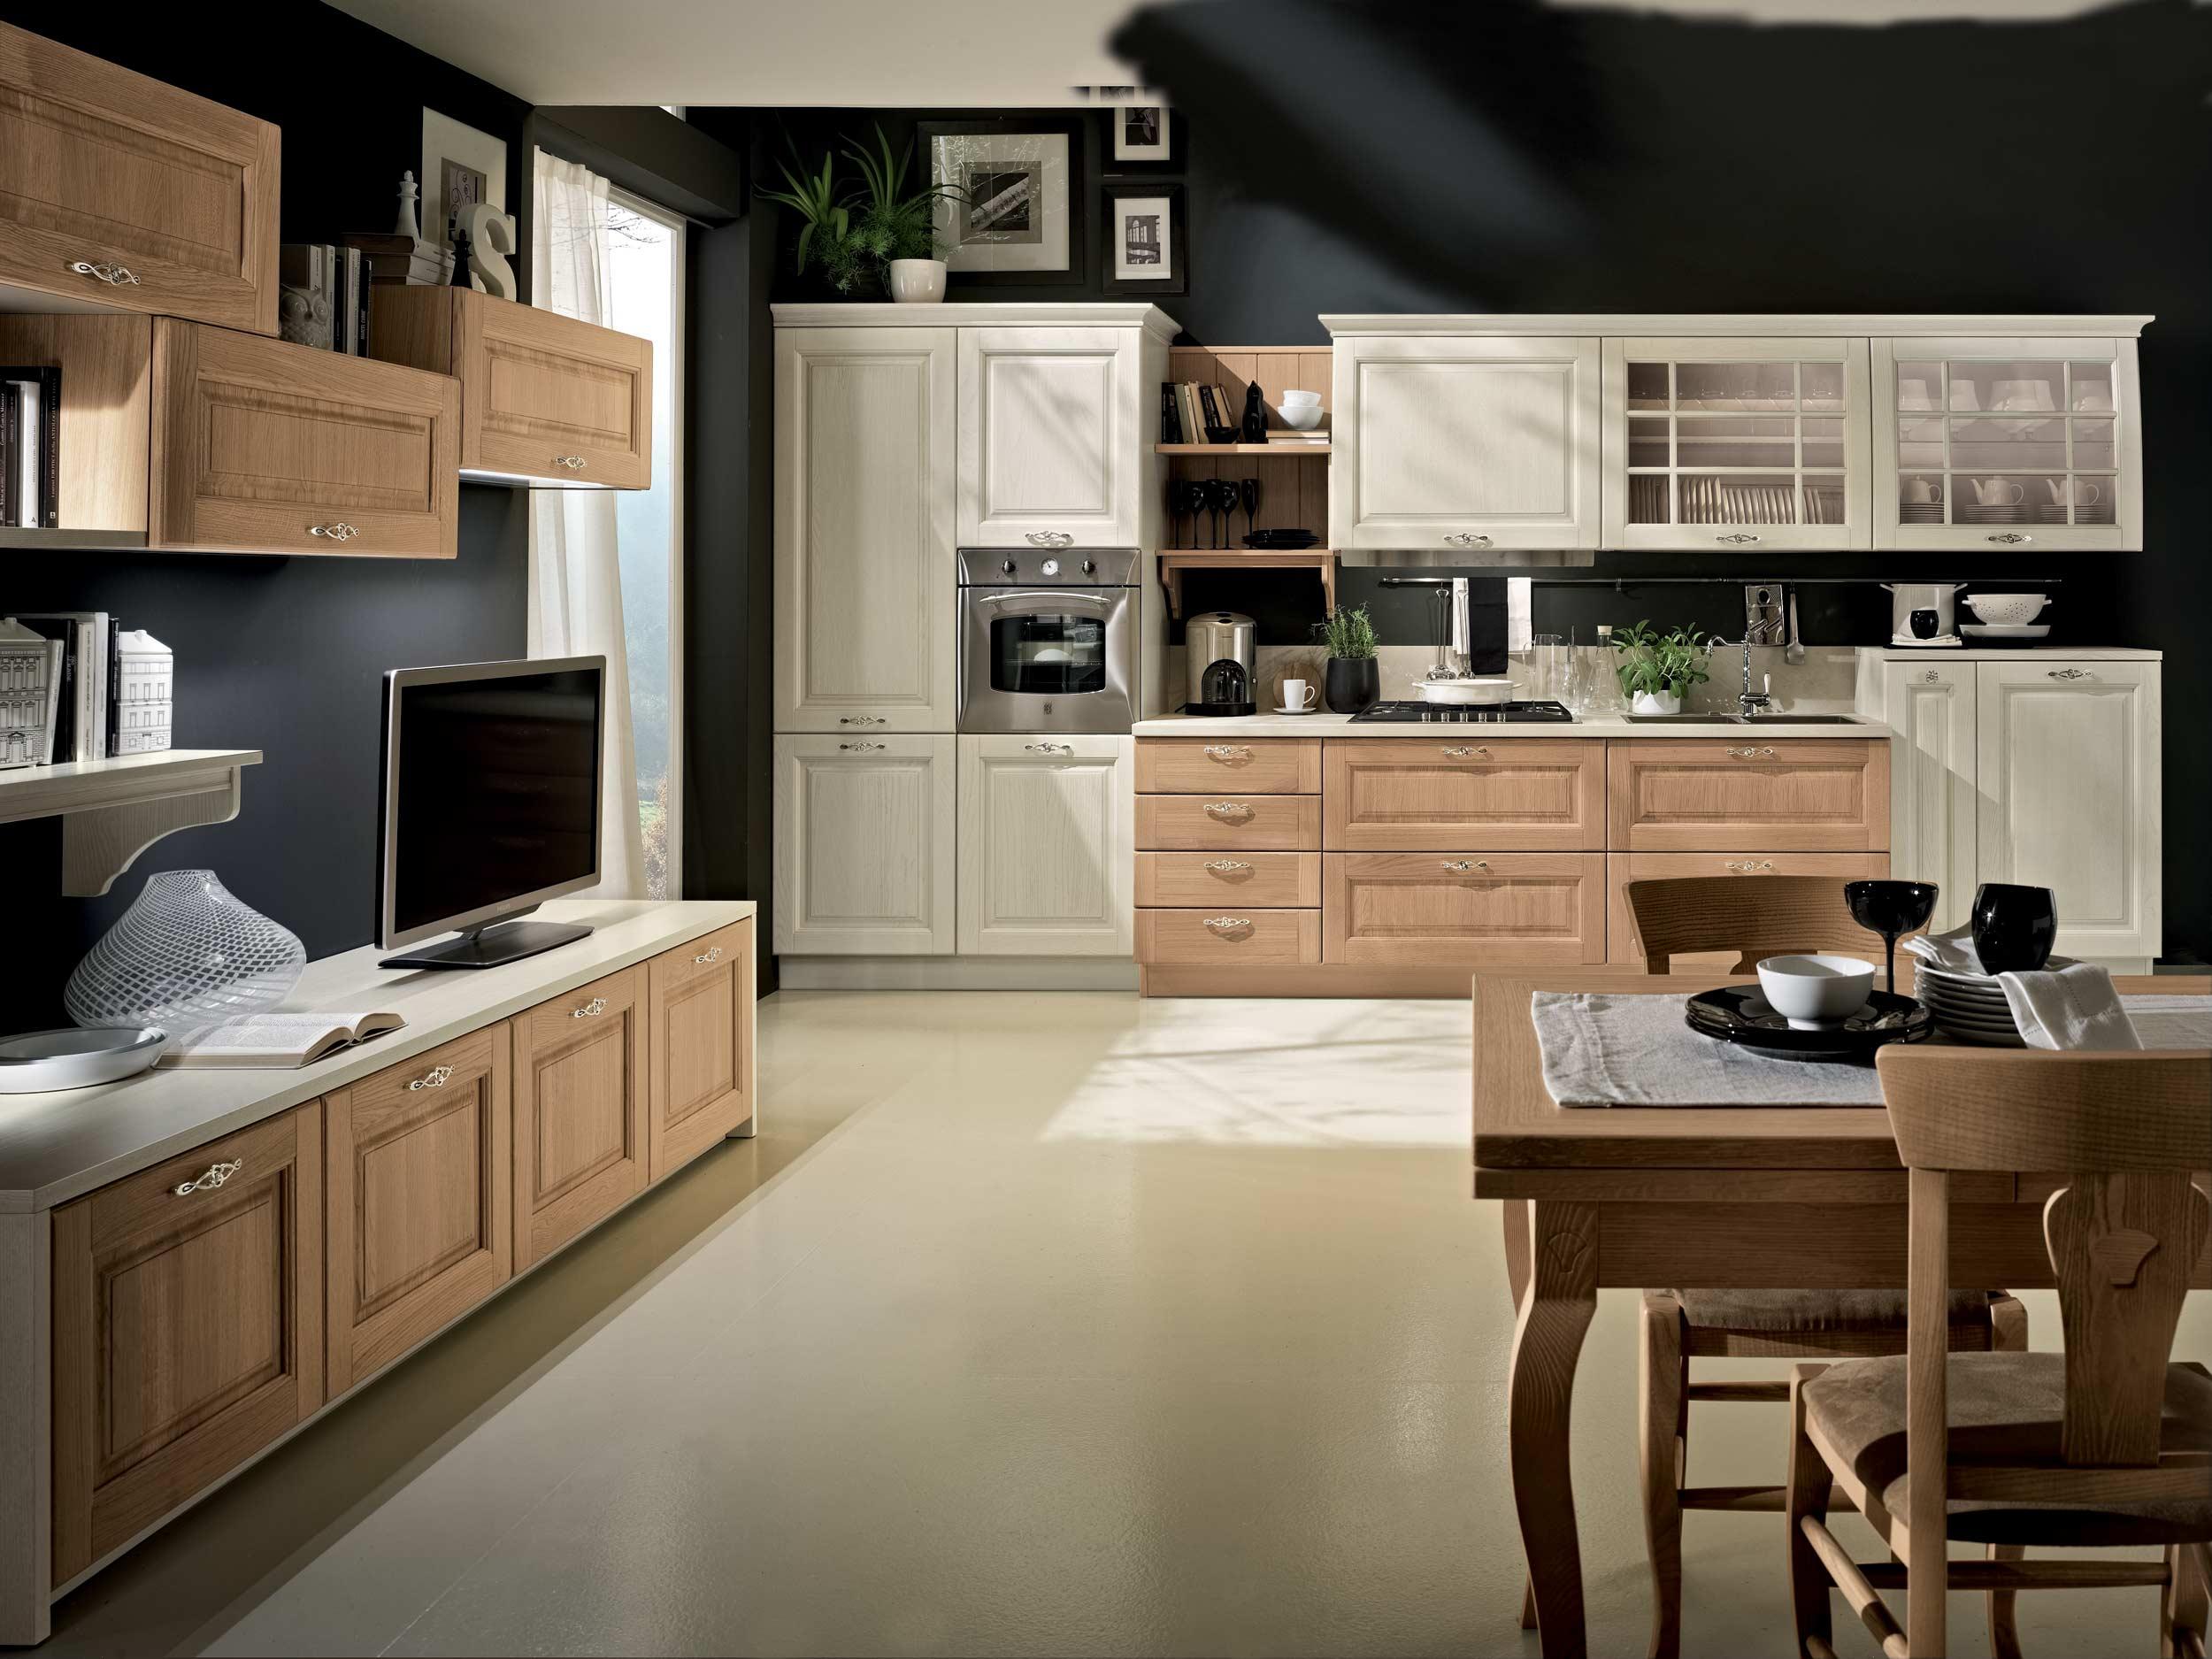 Cucina bolgheri stosa cucine ravenna - Cucine in rovere ...